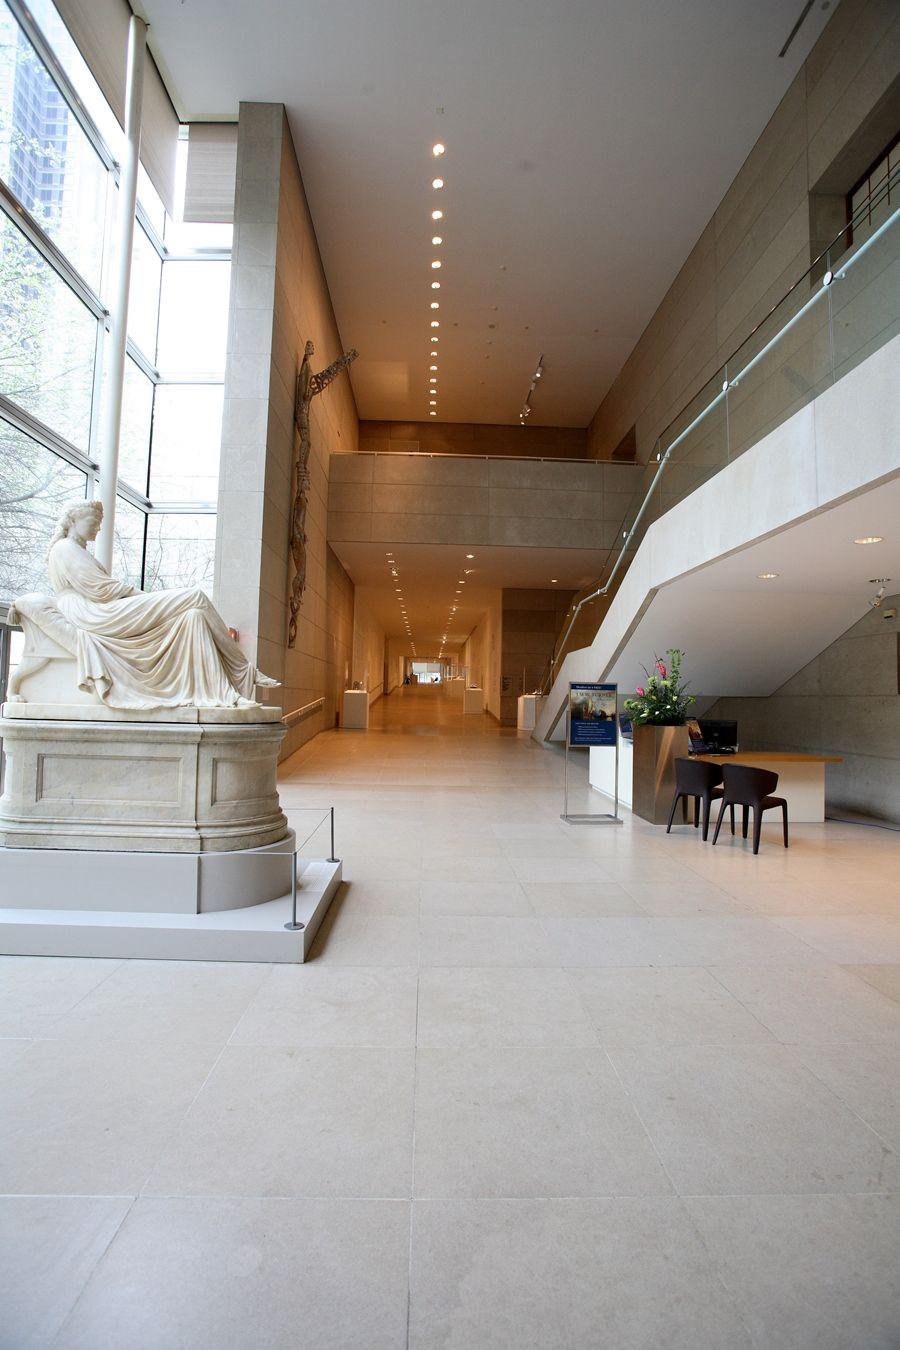 Home Dallas Museum Of Art Dallas Museum Of Art Dallas Museums Museum